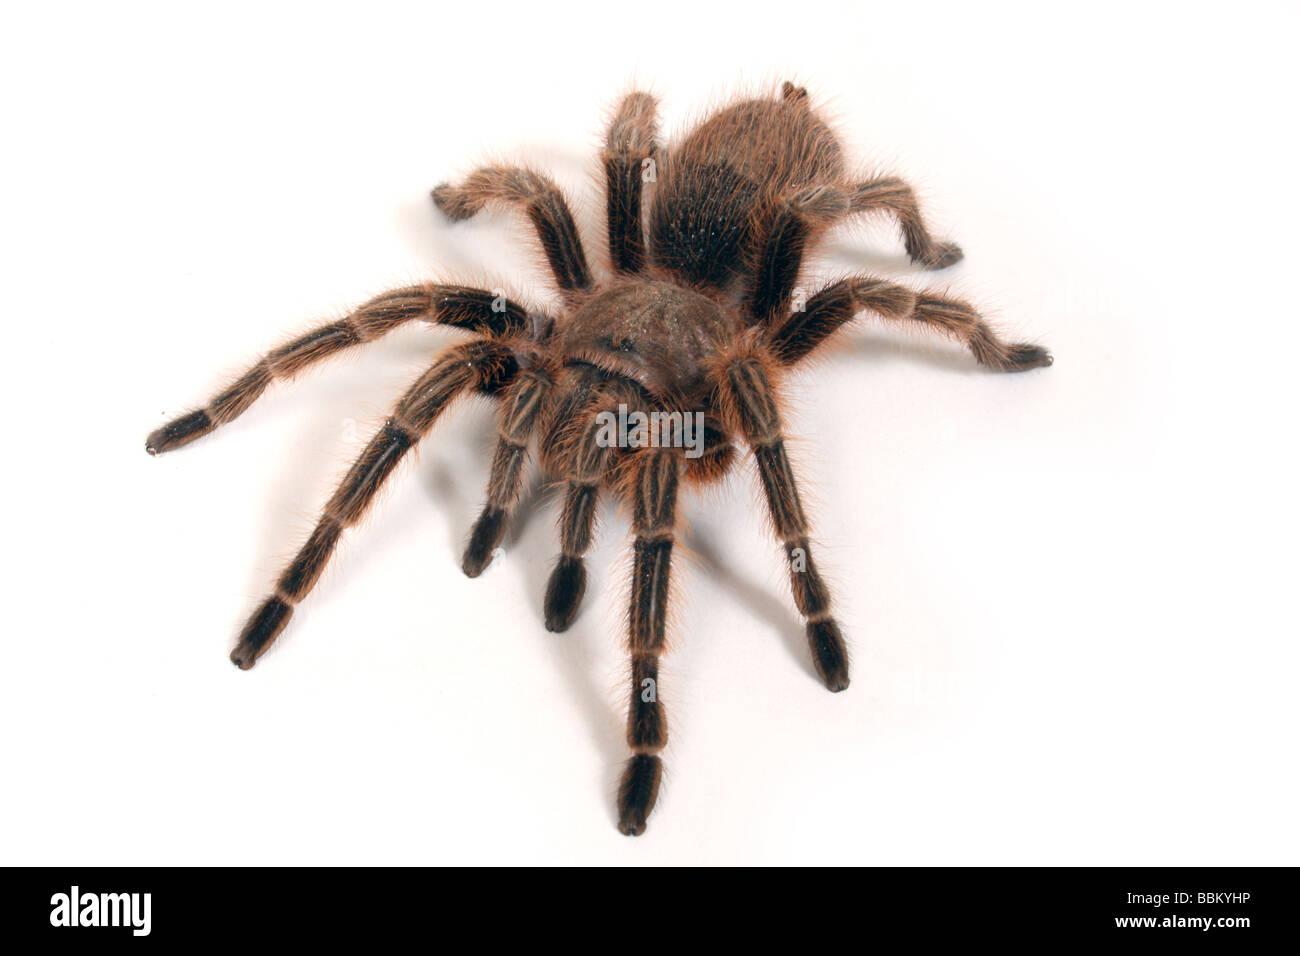 A Chilean Rose Tarantula - Stock Image